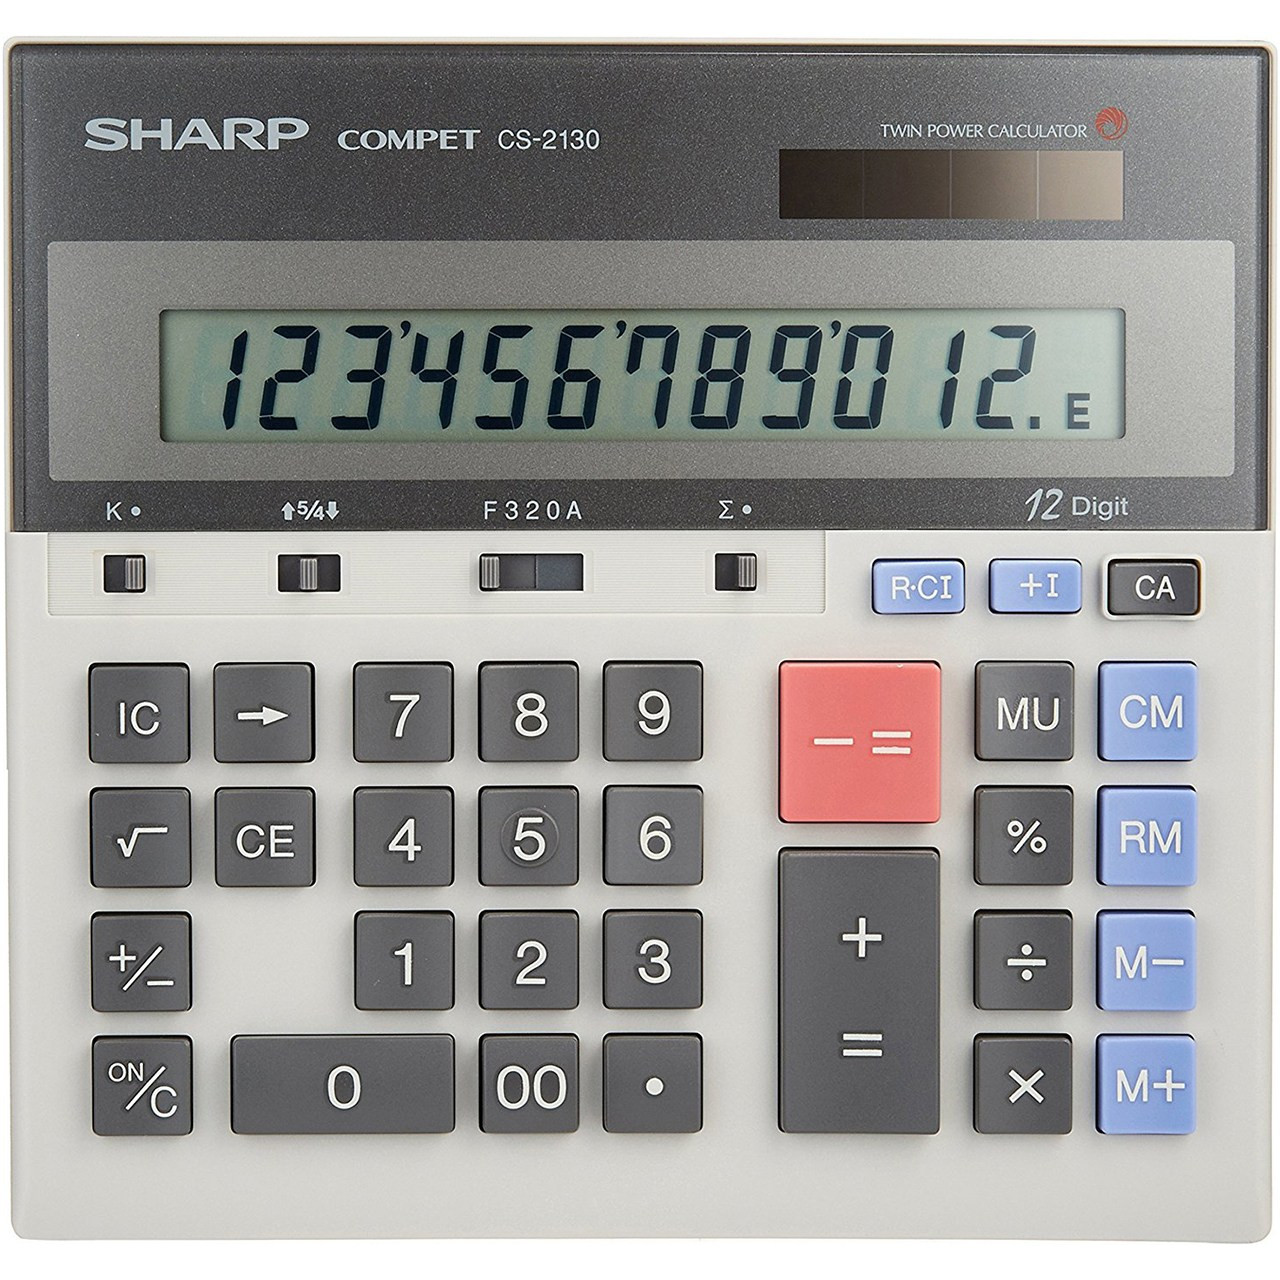 ماشین حساب شارپ مدل CS-2130RP | Sharp CS-2130RP Calculator